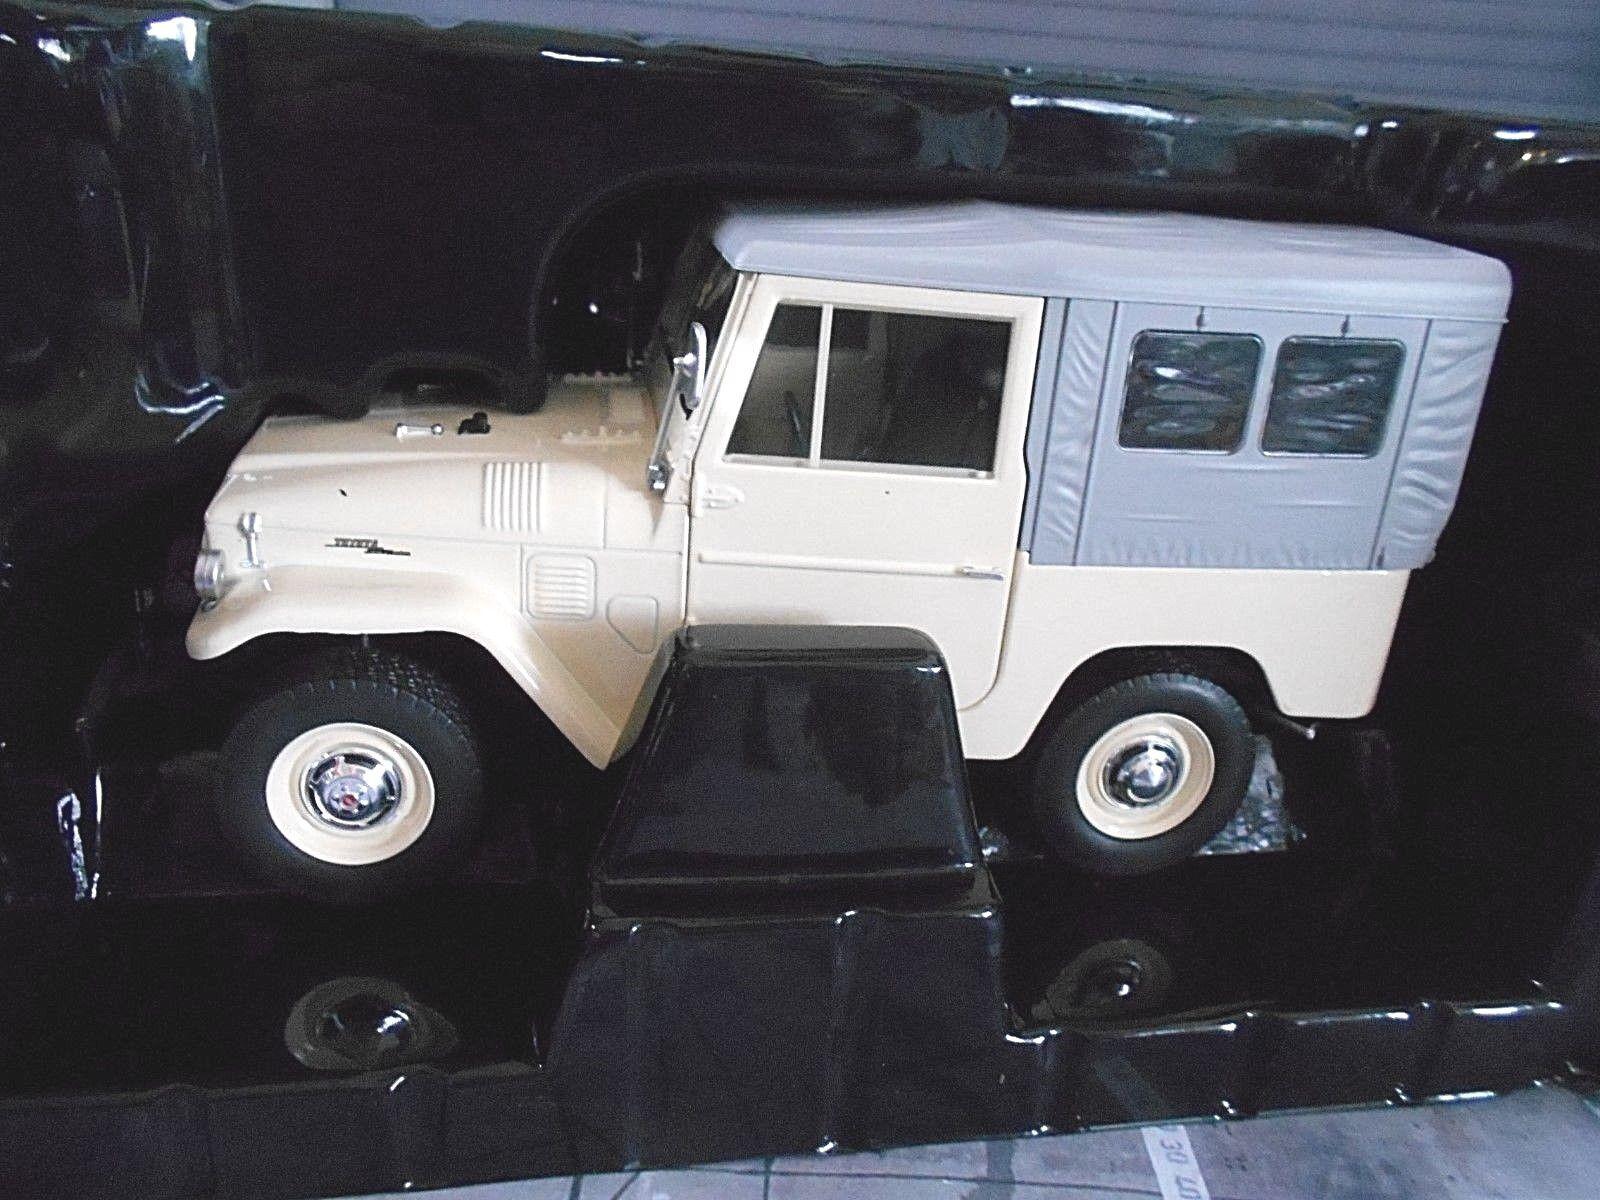 Toyota landcruiser Land Cruiser MKI fj40 4x4 1967 blancoo blancoo blancoo Cream Ixo triple 9 1 18 69320d